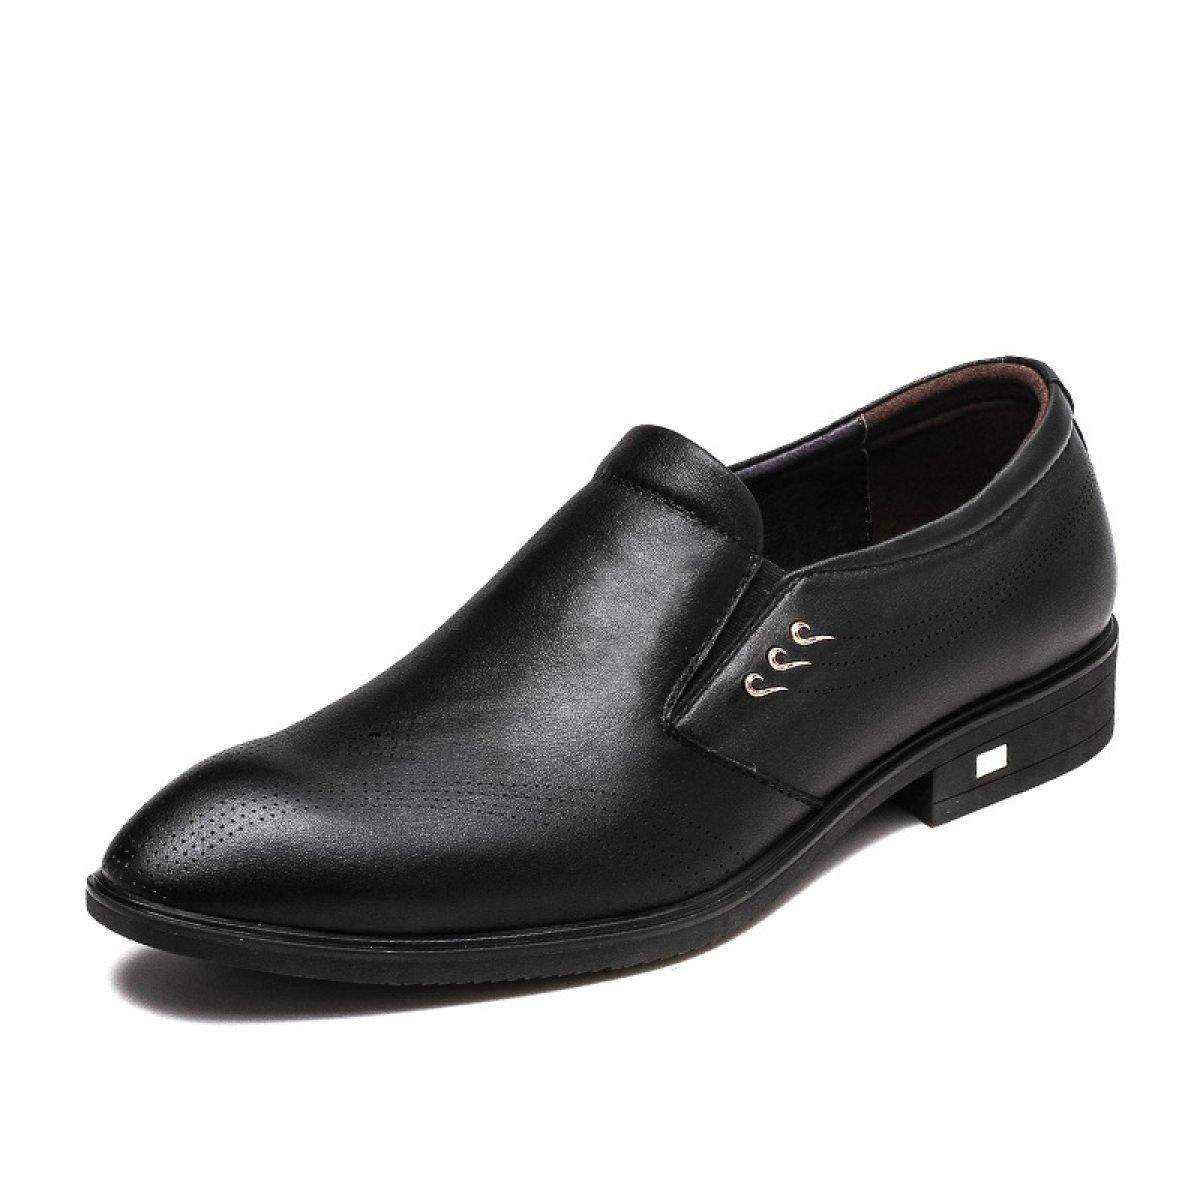 GTYMFH Männer 'Modern Lace Formal Leder Oxford Kleid Schuhe